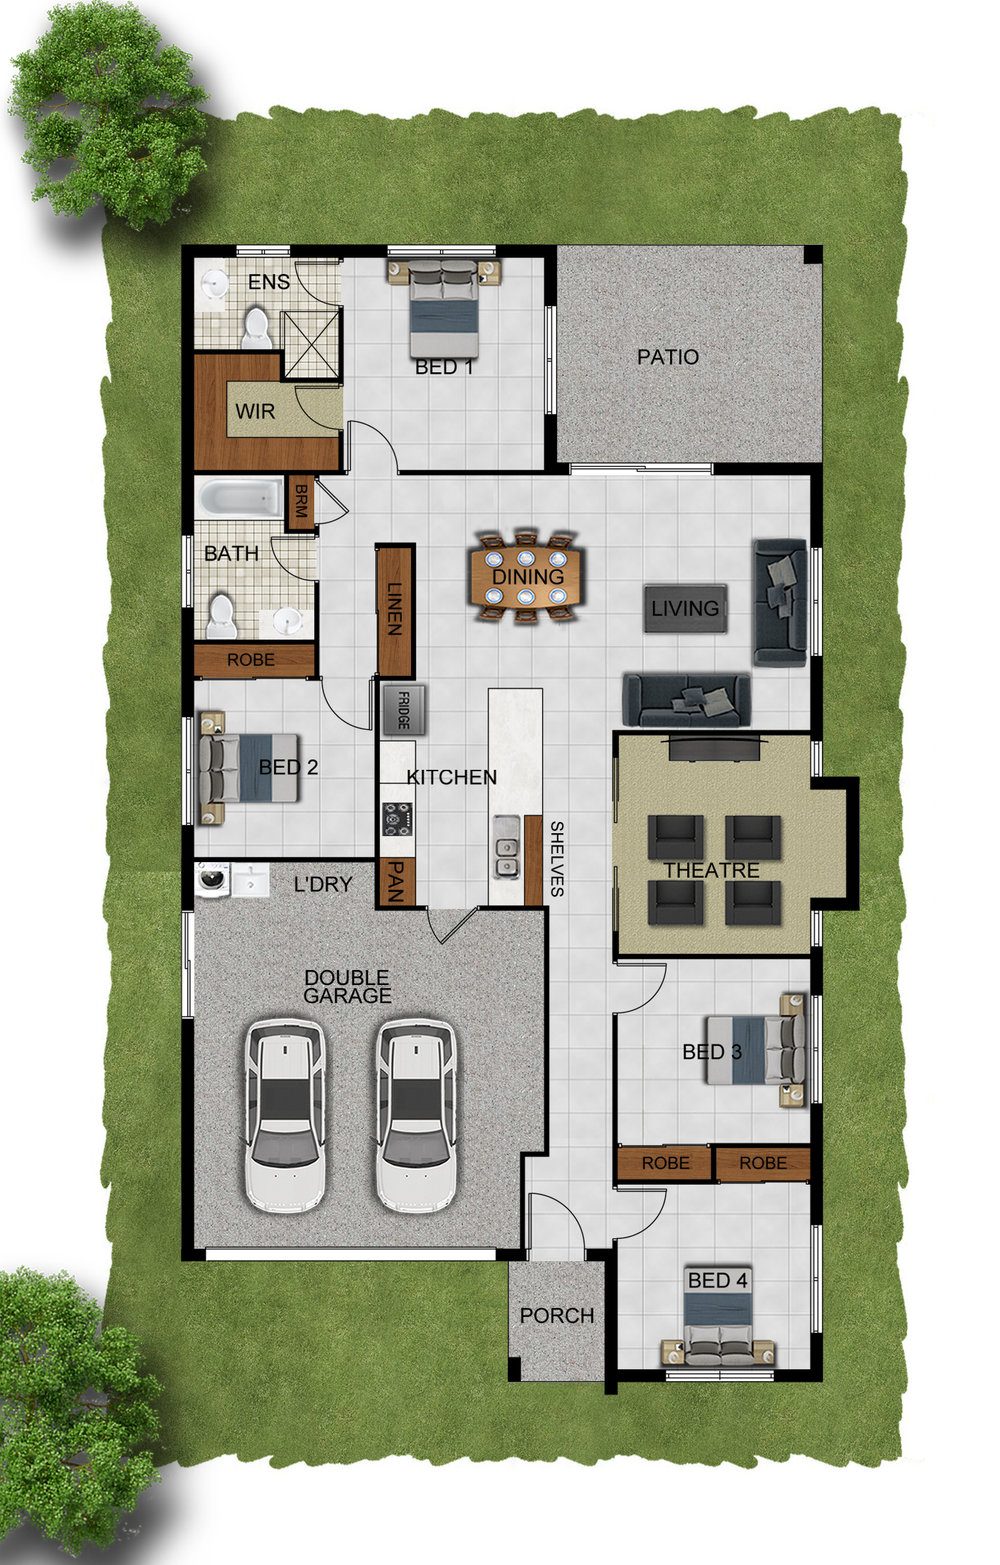 The Sheraton Floor Plan.jpg